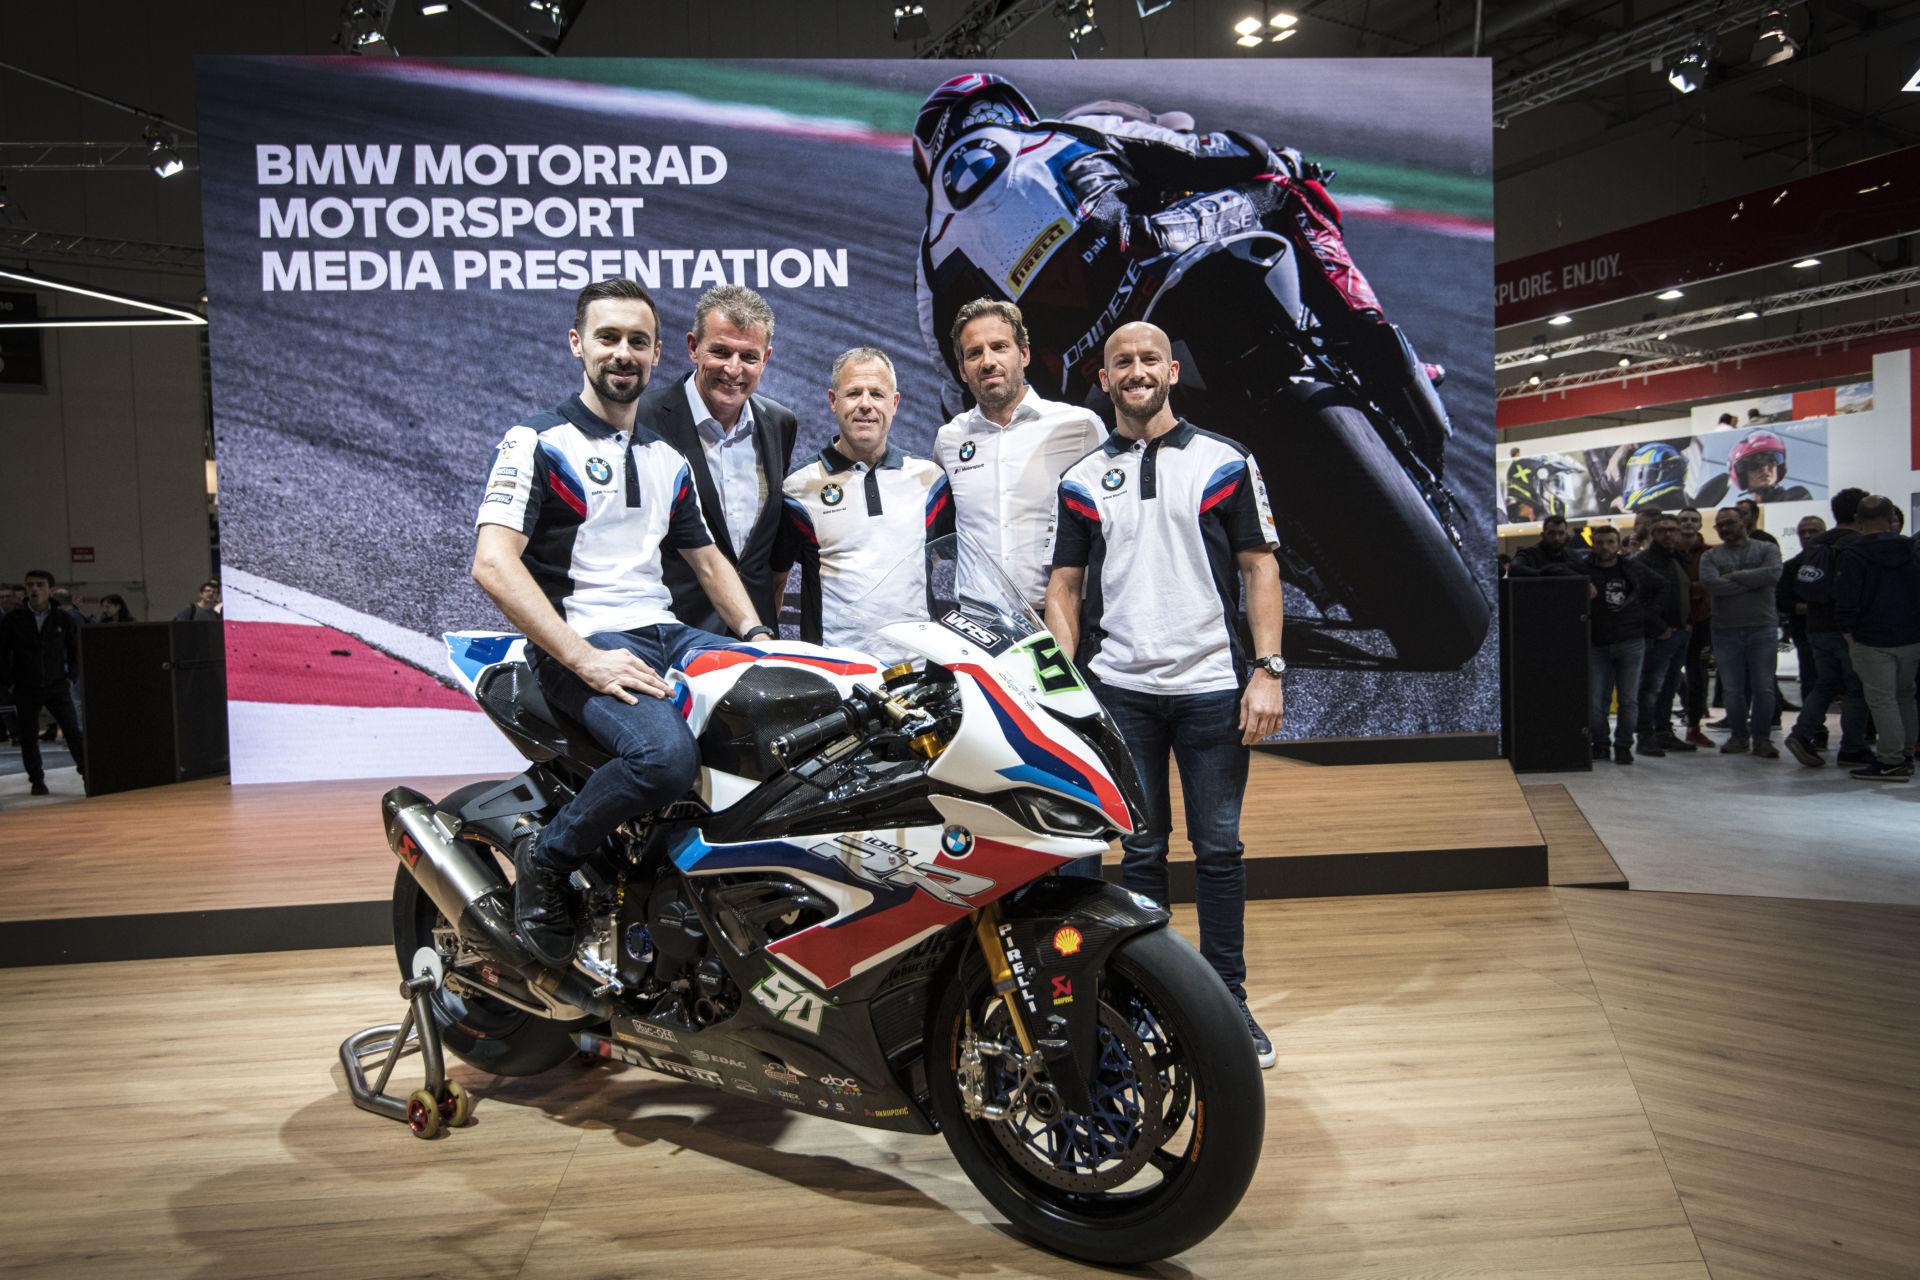 (From left) Eugene Laverty; Dr. Markus Schramm, Head of BMW Motorrad; BMW Motorrad WorldSBK Team Principal Shaun Muir; Marc Bongers, BMW Motorrad Motorsport Director; and Tom Sykes at EICMA. Photo courtesy of BMW Motorrad Motorsport.